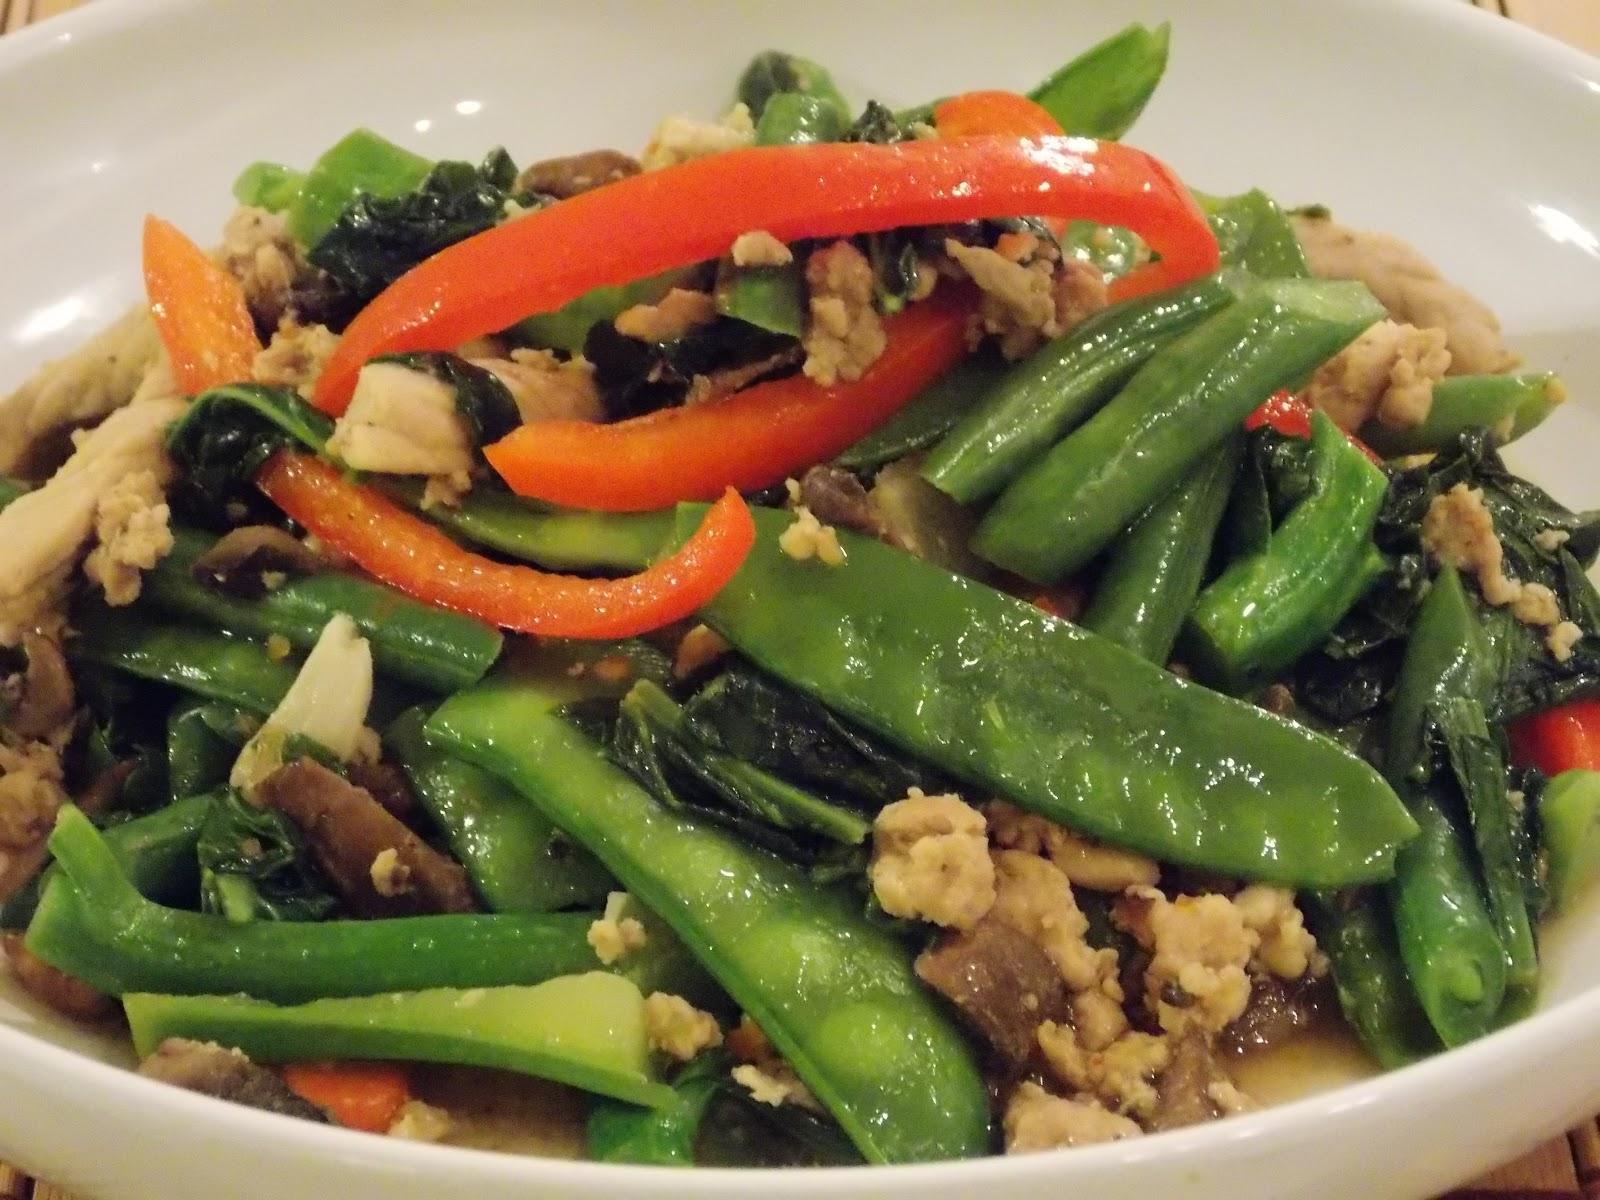 Chicken-Green Bean Yellow Chili Stir-Fry Recipe — Dishmaps